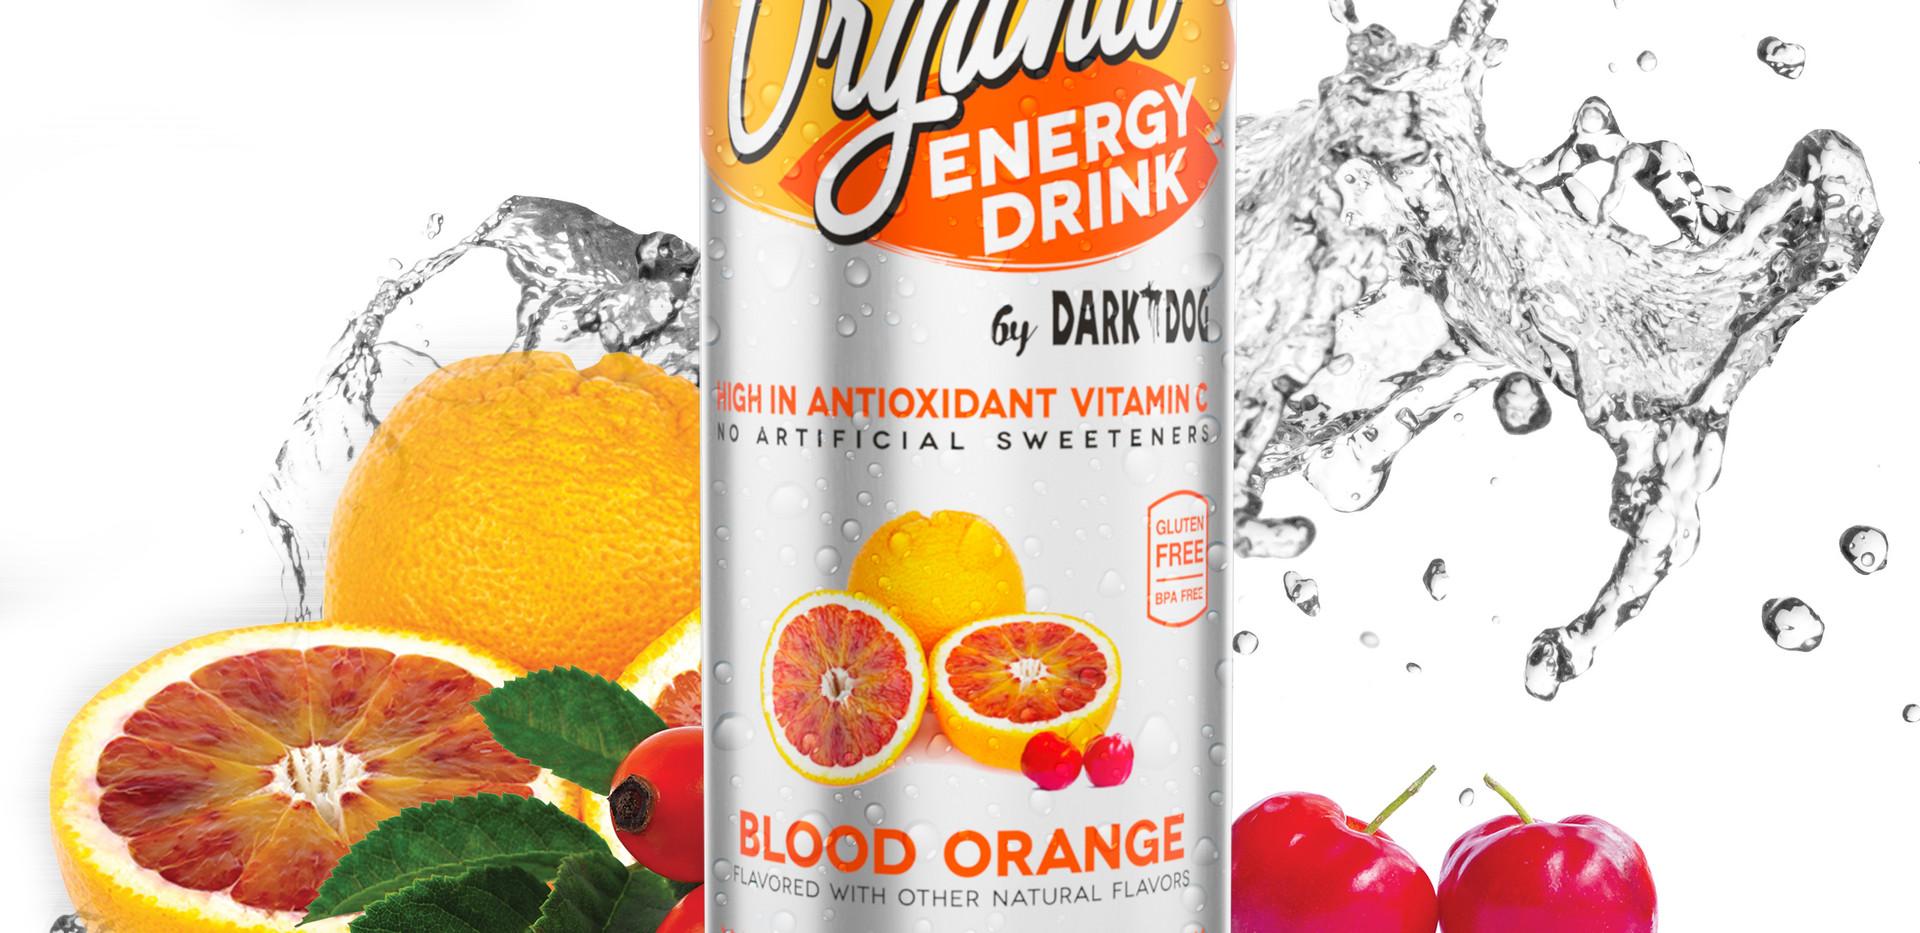 ORGANIC ENERGY DRINK BY DARK DOG BLOOD ORANGE